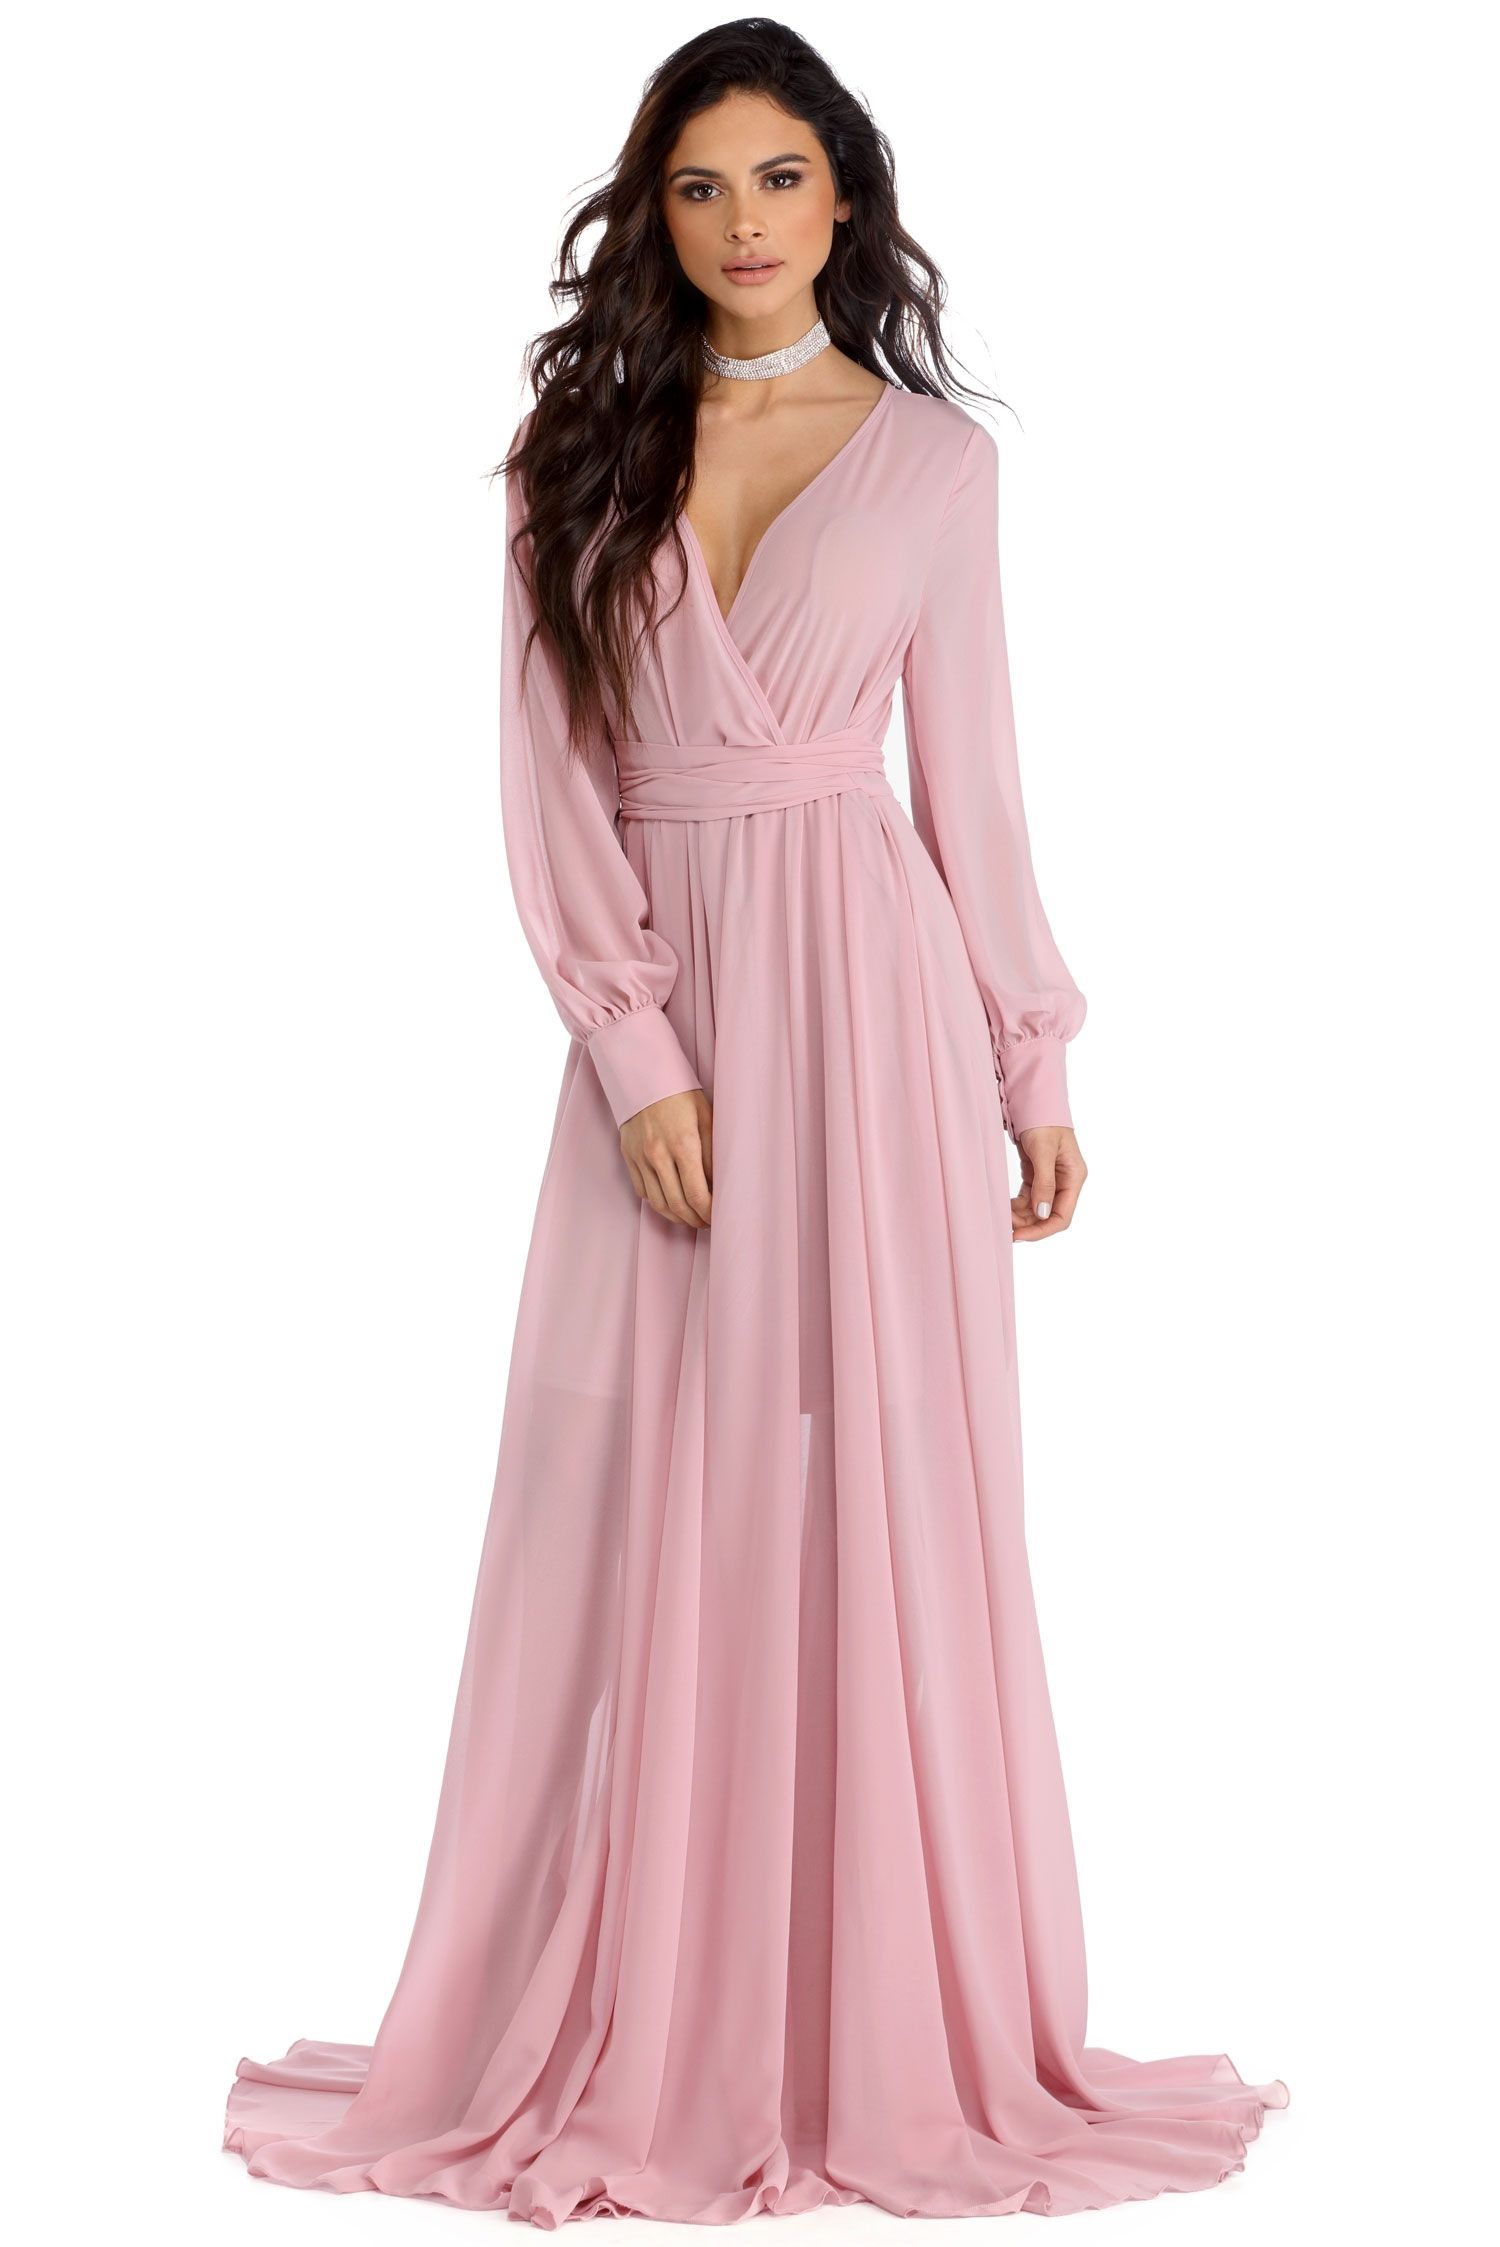 Charlotte Mauve Romance Dress | Wedding | Pinterest | Boda